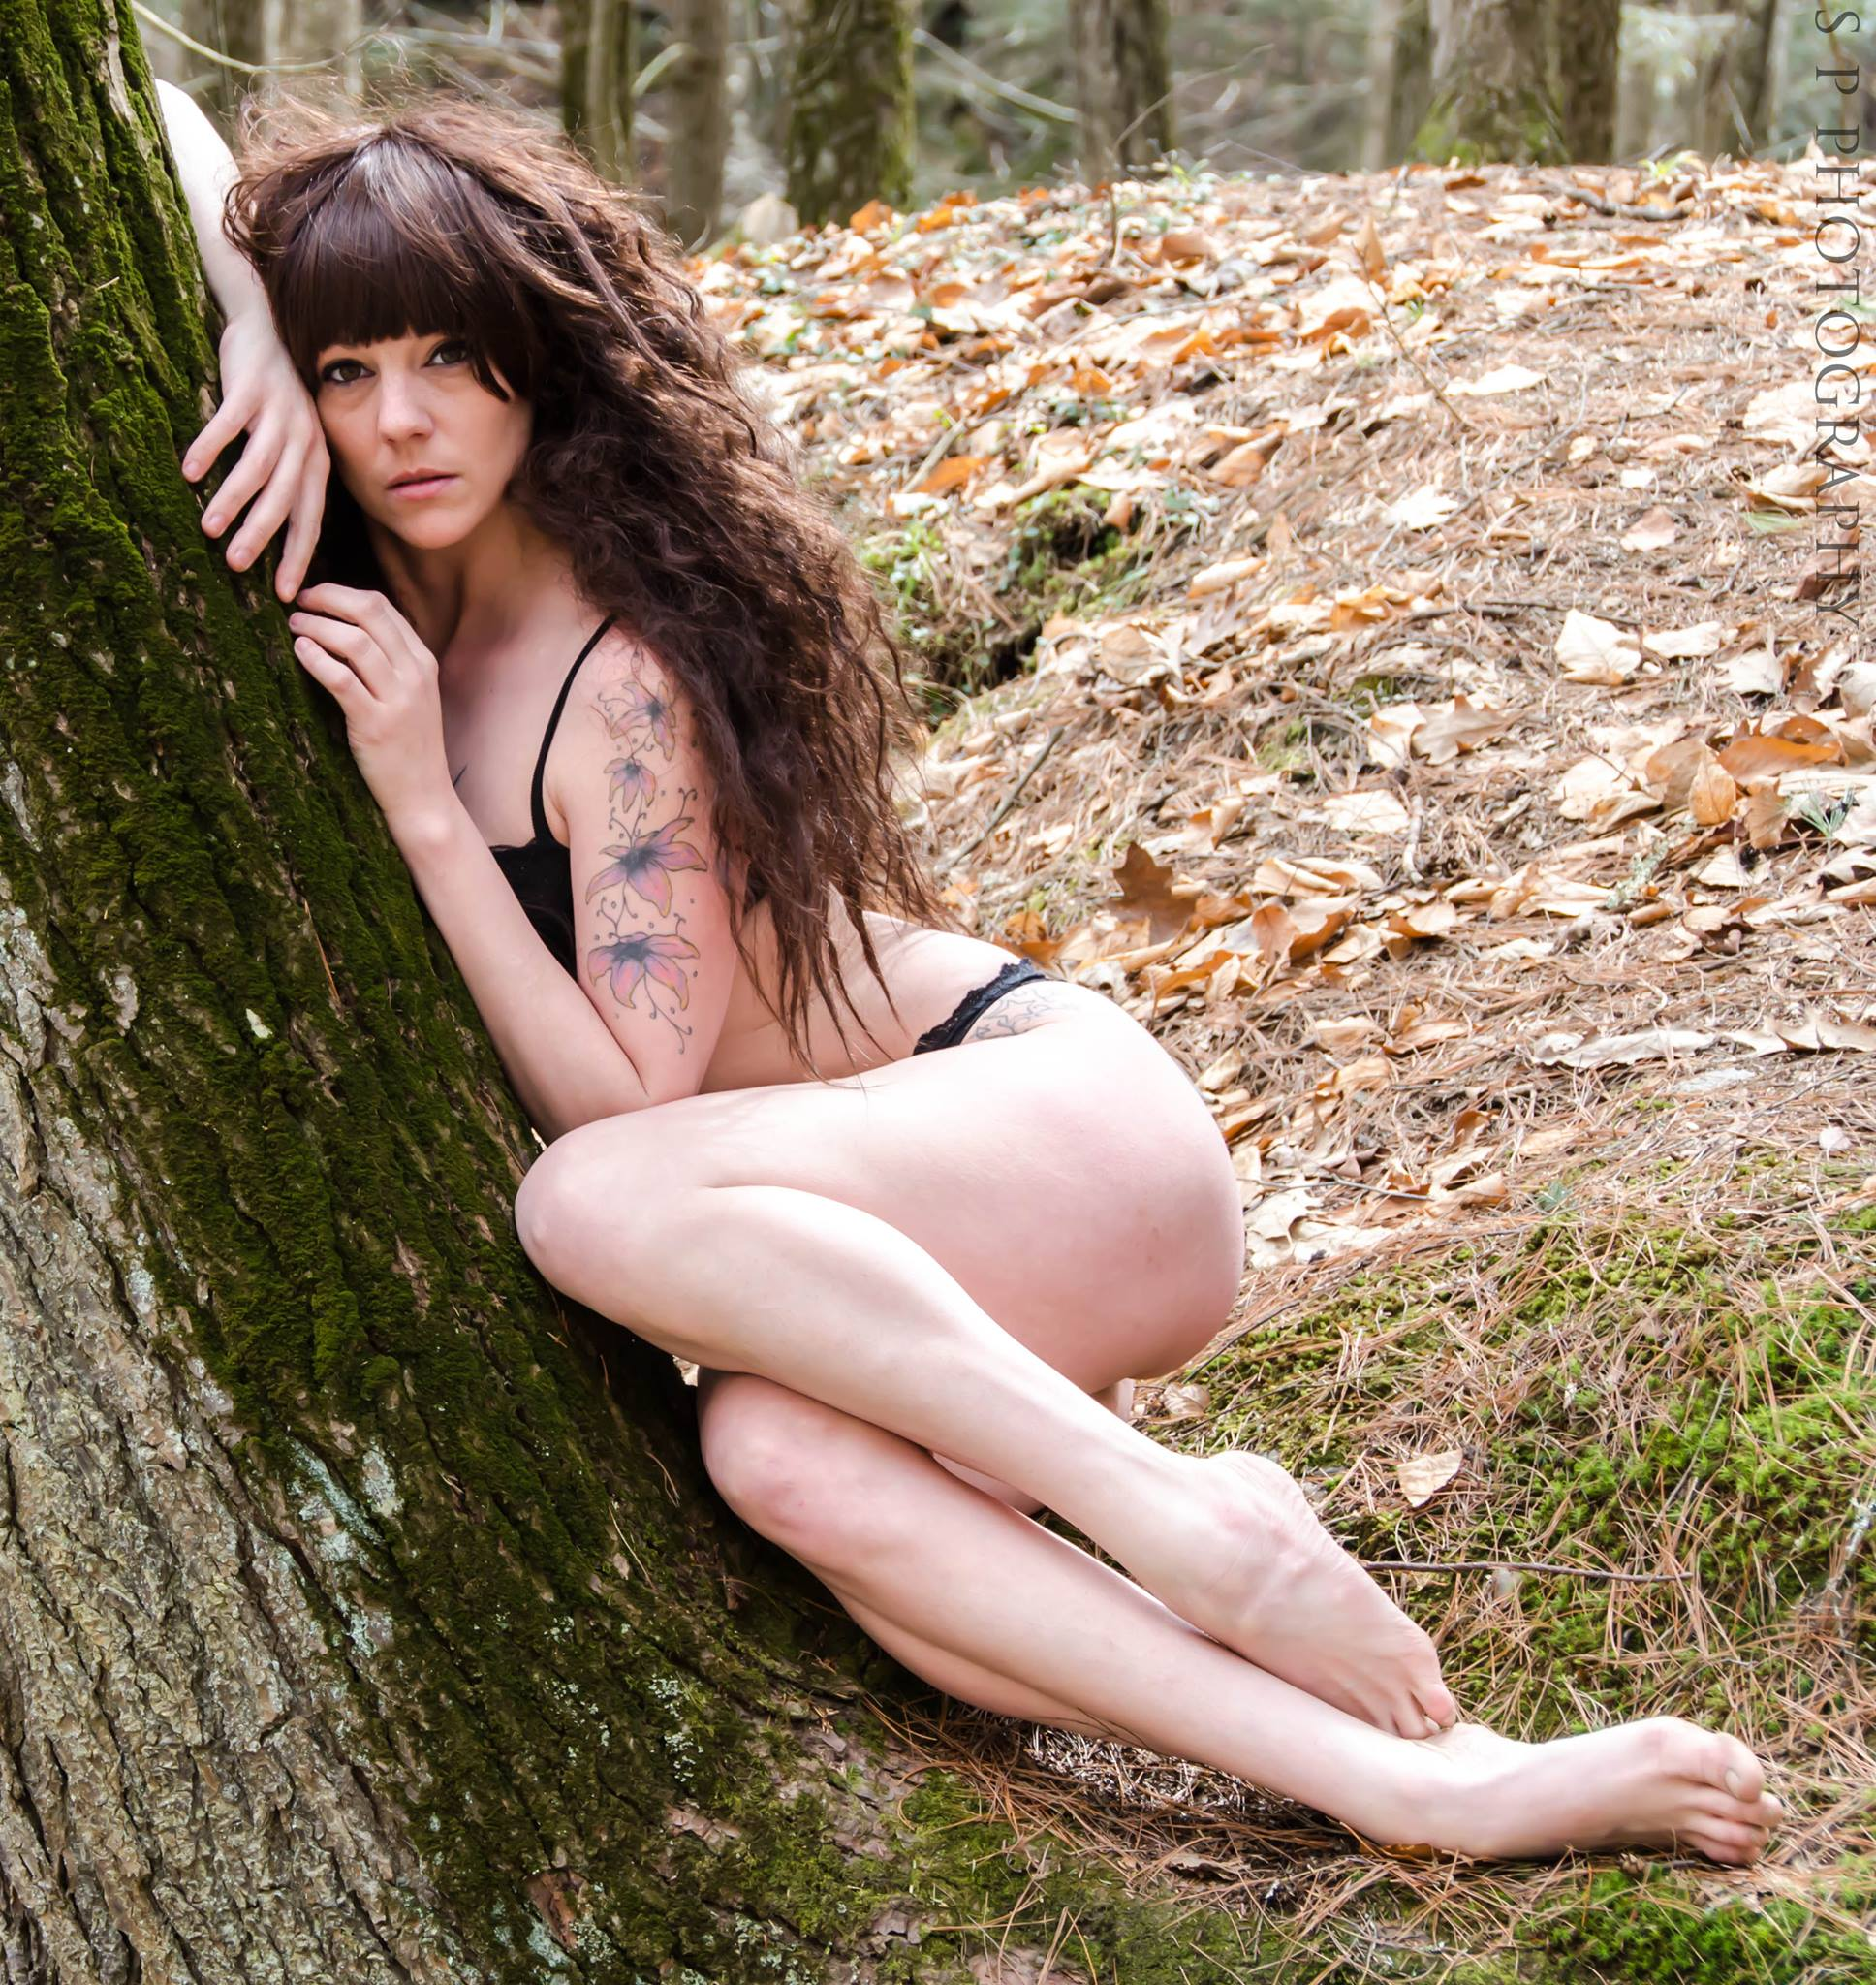 isabel-marie-vinson-nude-in-public